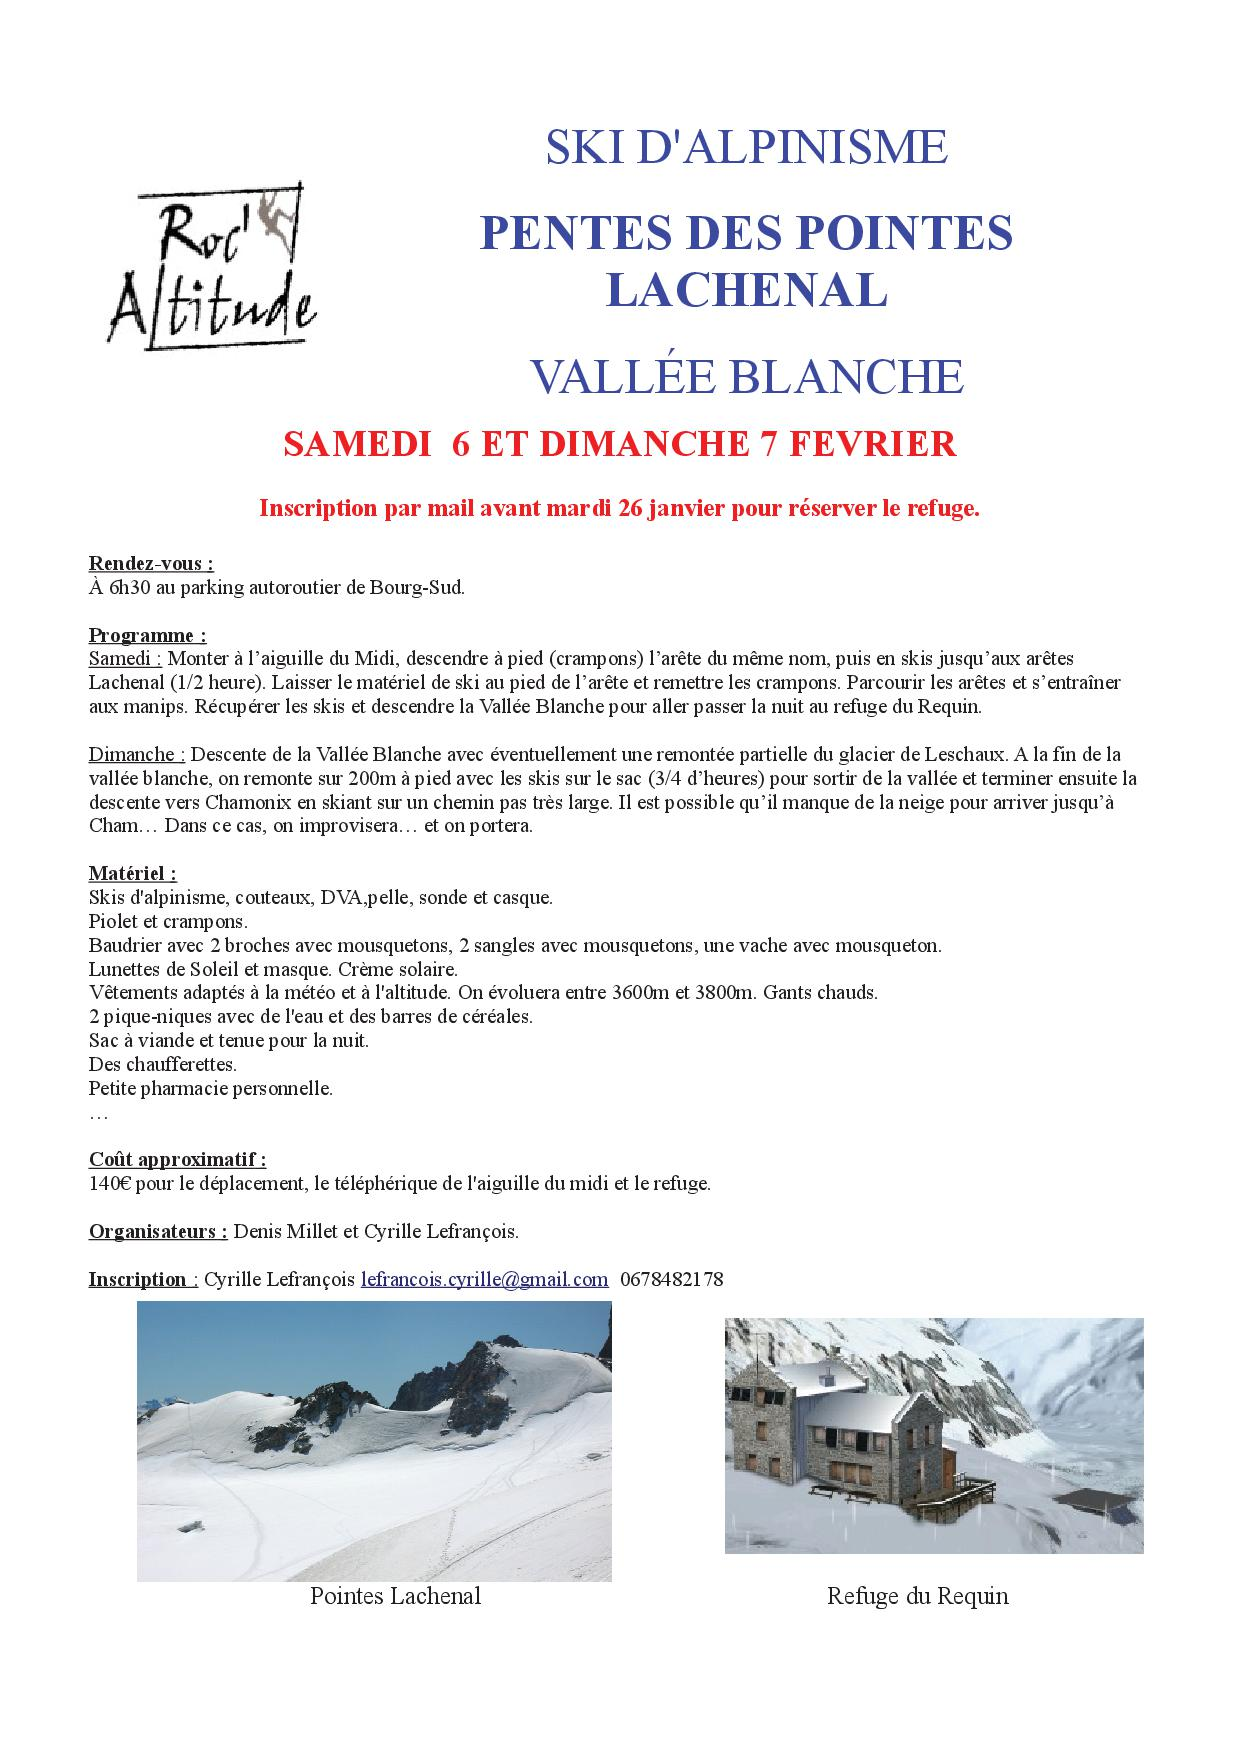 Ski Alpinisme Pointes Lachenal et Vallée Blanche